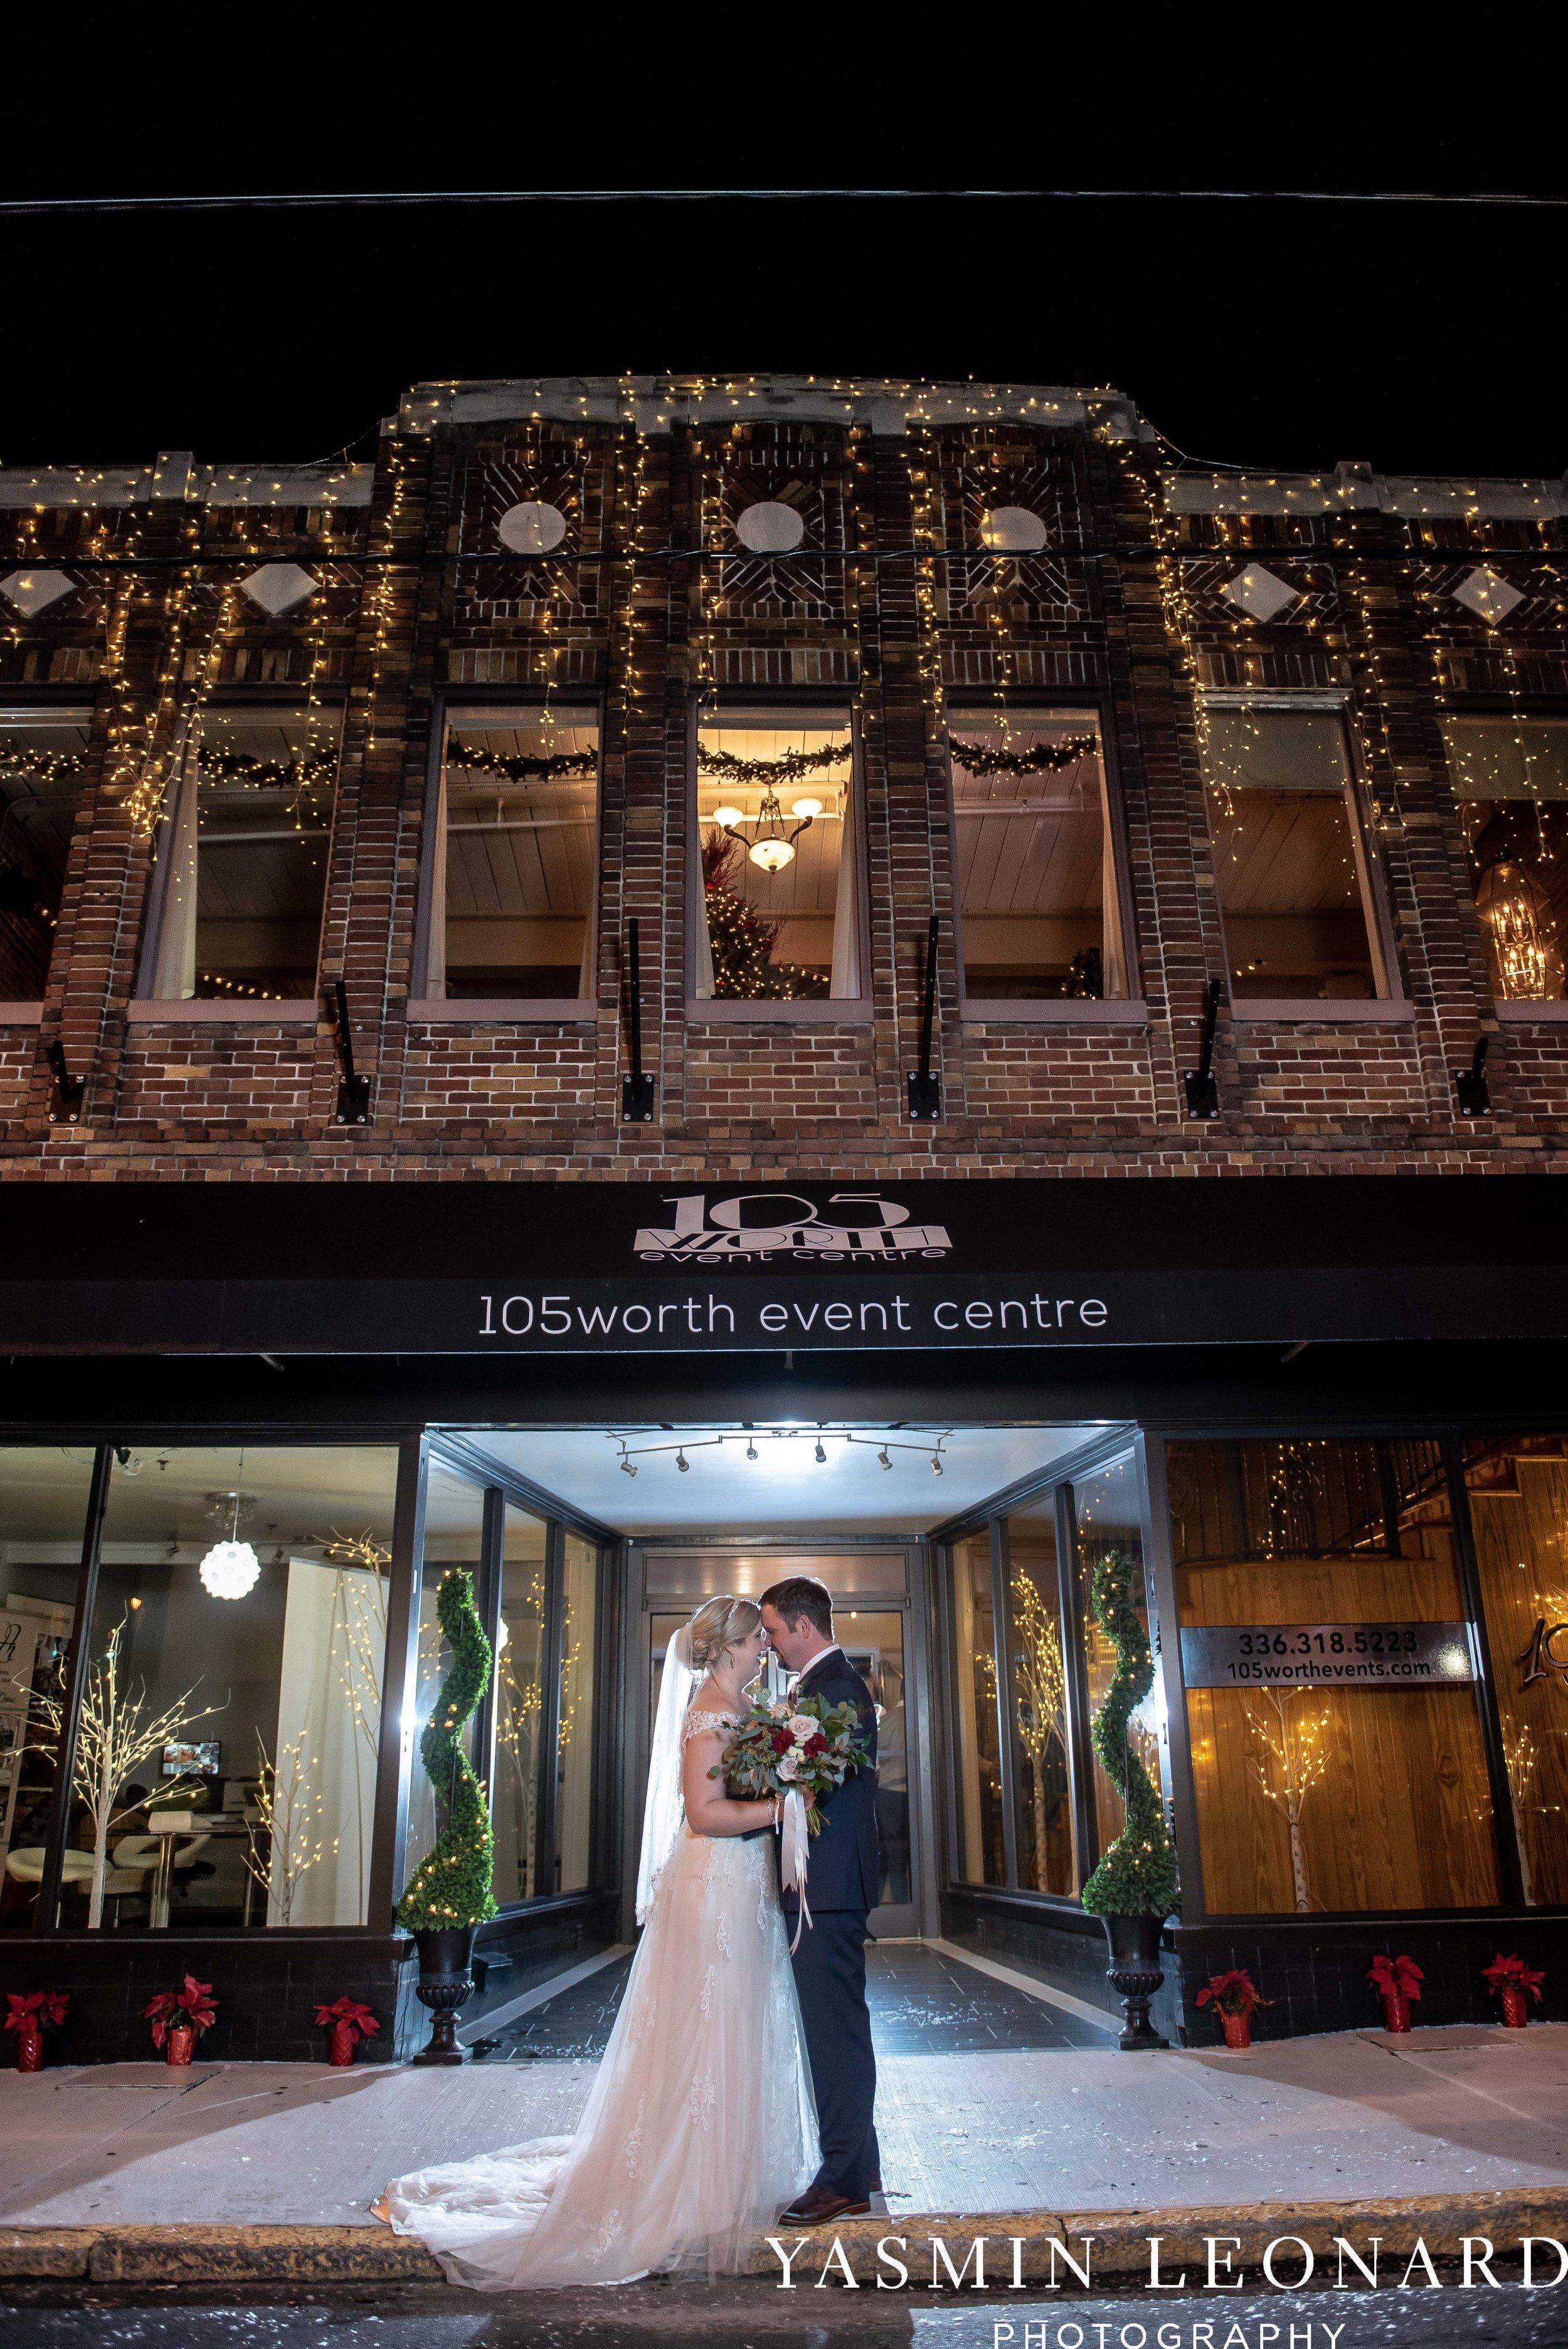 Rebekah and Matt - 105 Worth Event Centre - Yasmin Leonard Photography - Asheboro Wedding - NC Wedding - High Point Weddings - Triad Weddings - Winter Wedding-38.jpg